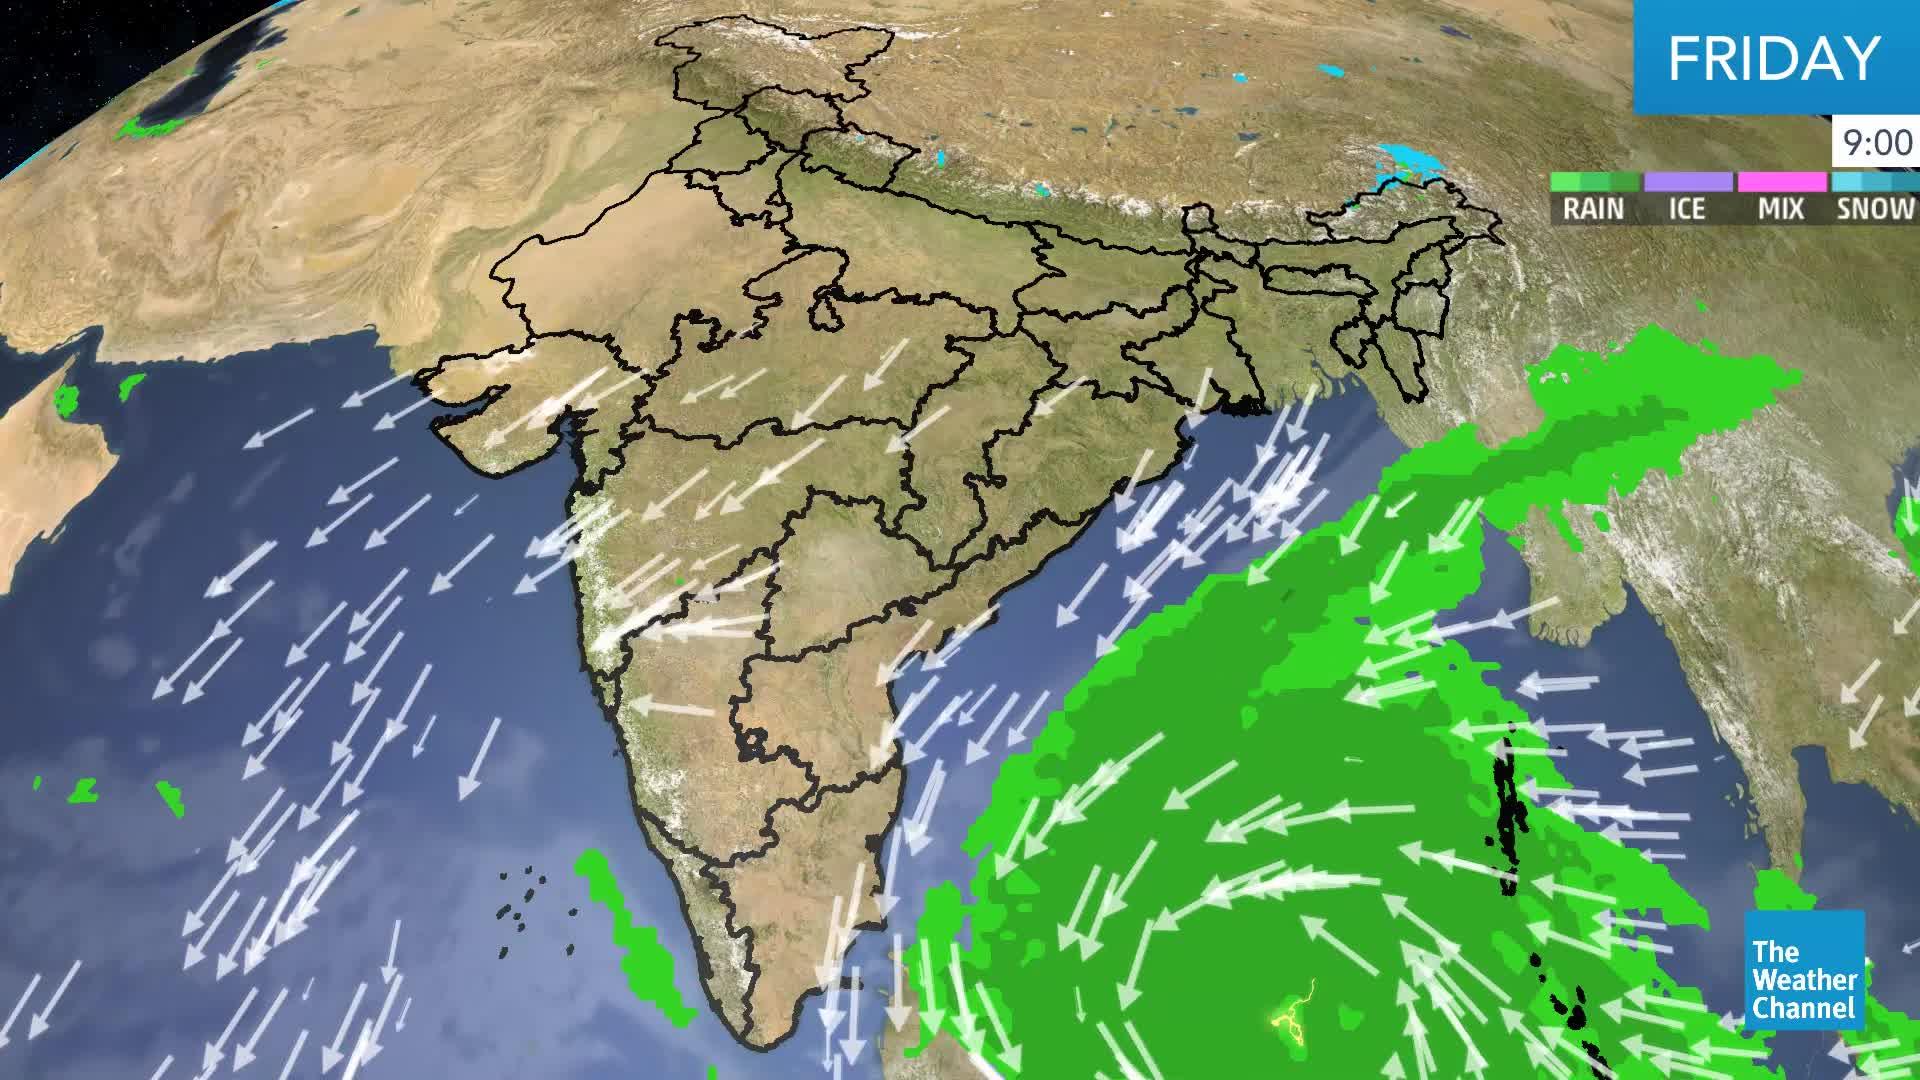 Cyclone Phethai Winds Towards Andhra Pradesh; Landfall on Monday